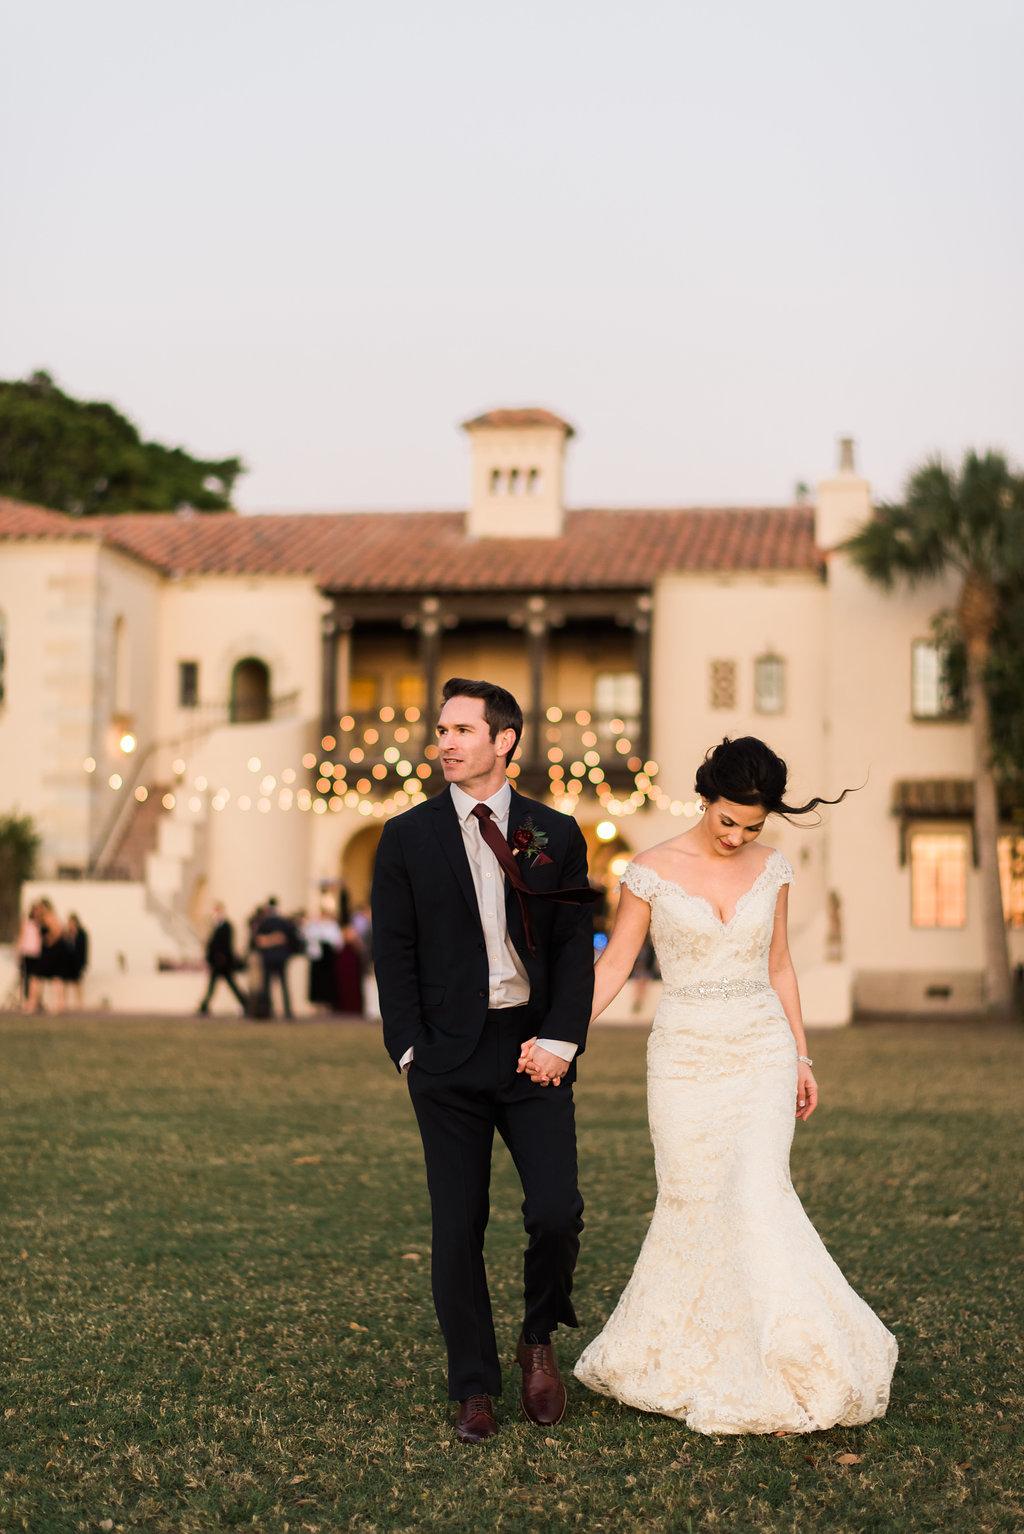 Jet Set Wed :: Candlelit Riverside Romance In Berry & Blush